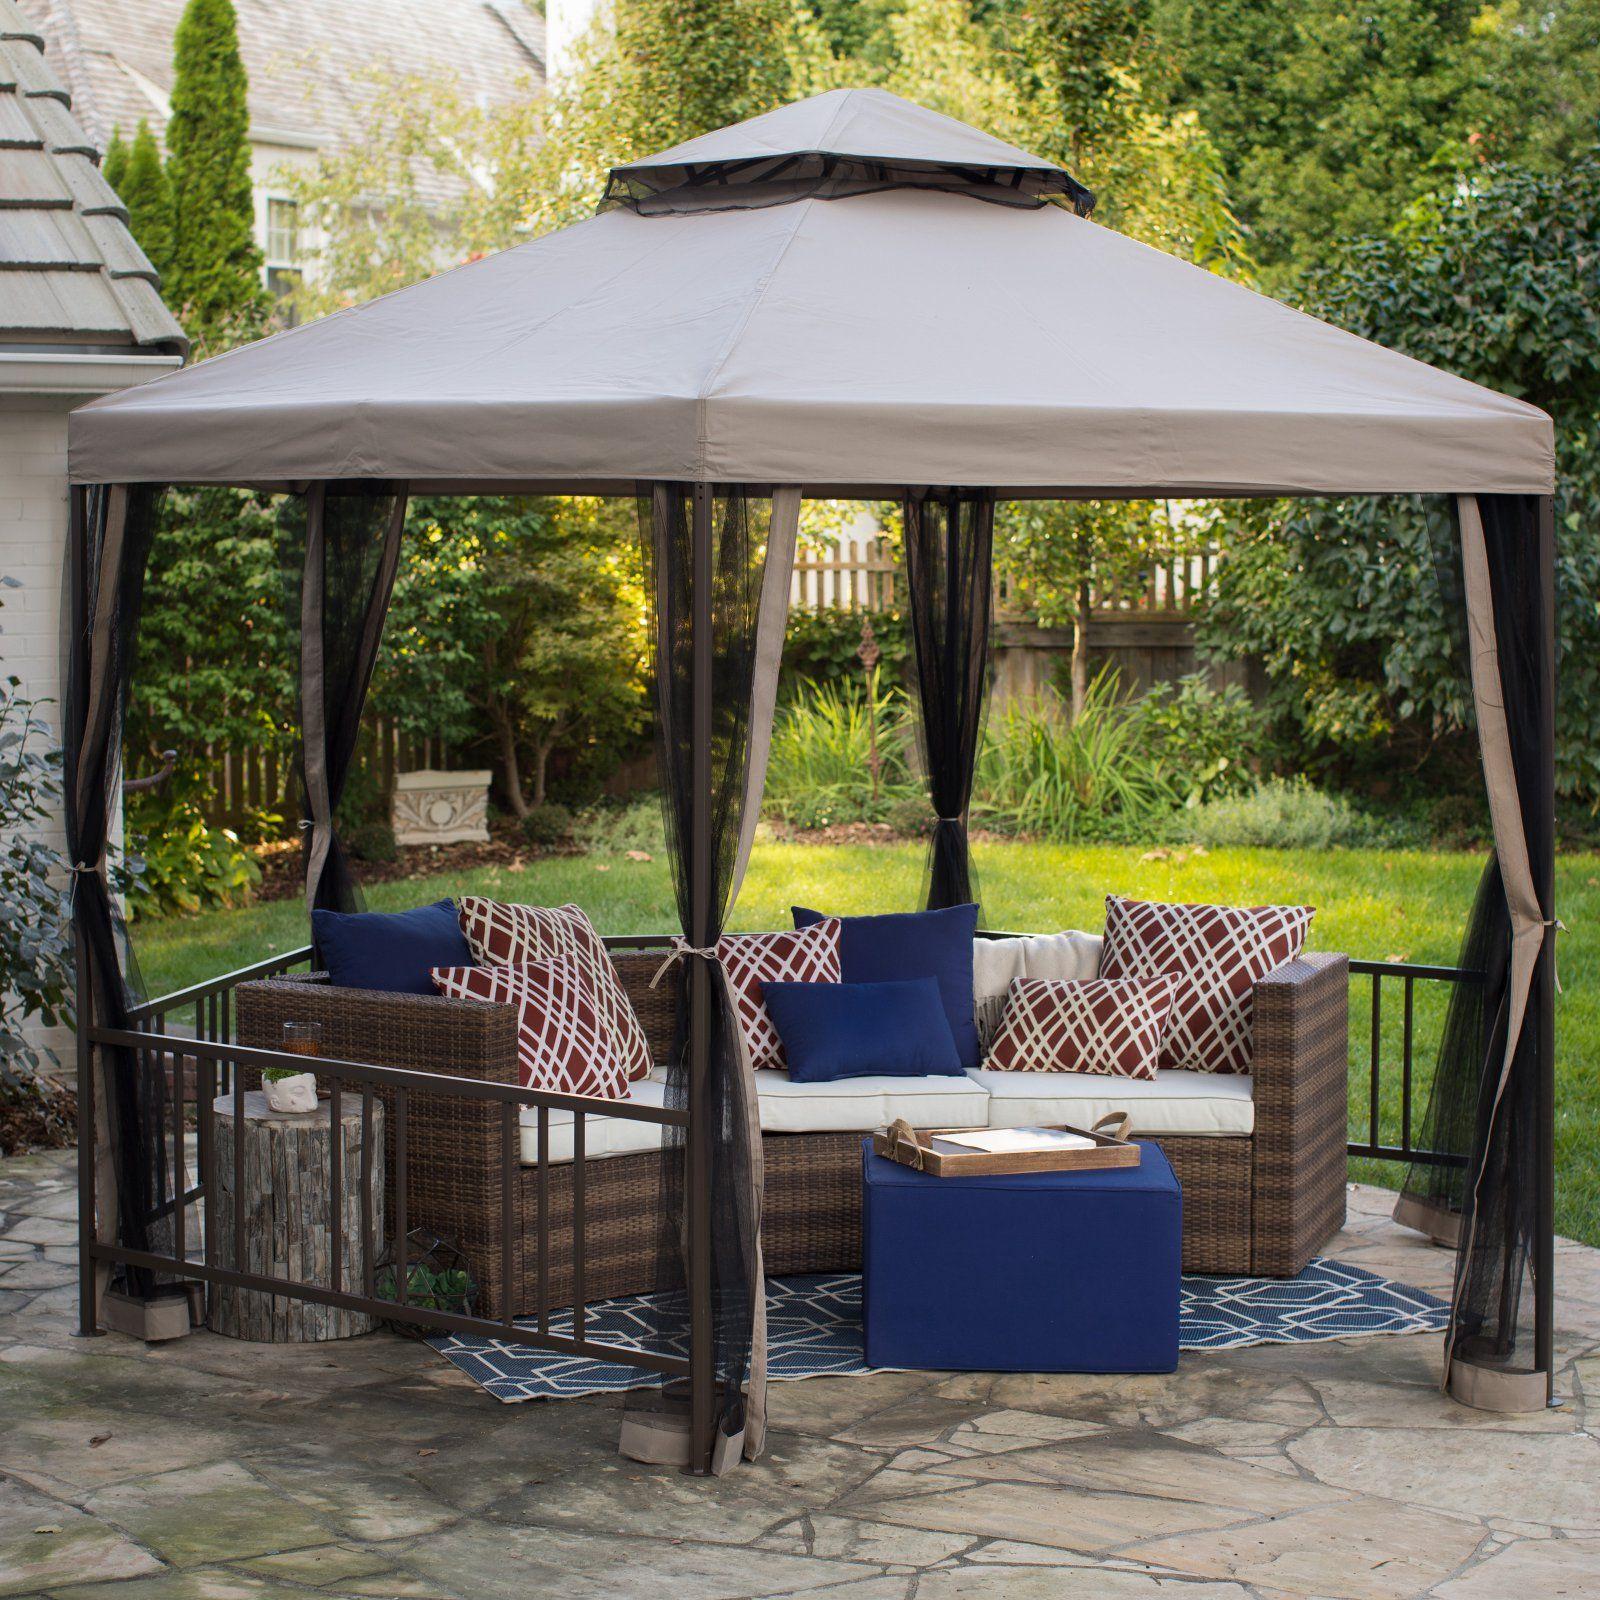 318f5d55d65e8a54c1236500dd645ba9 - Better Homes And Gardens Sullivan Ridge Hardtop Gazebo With Netting